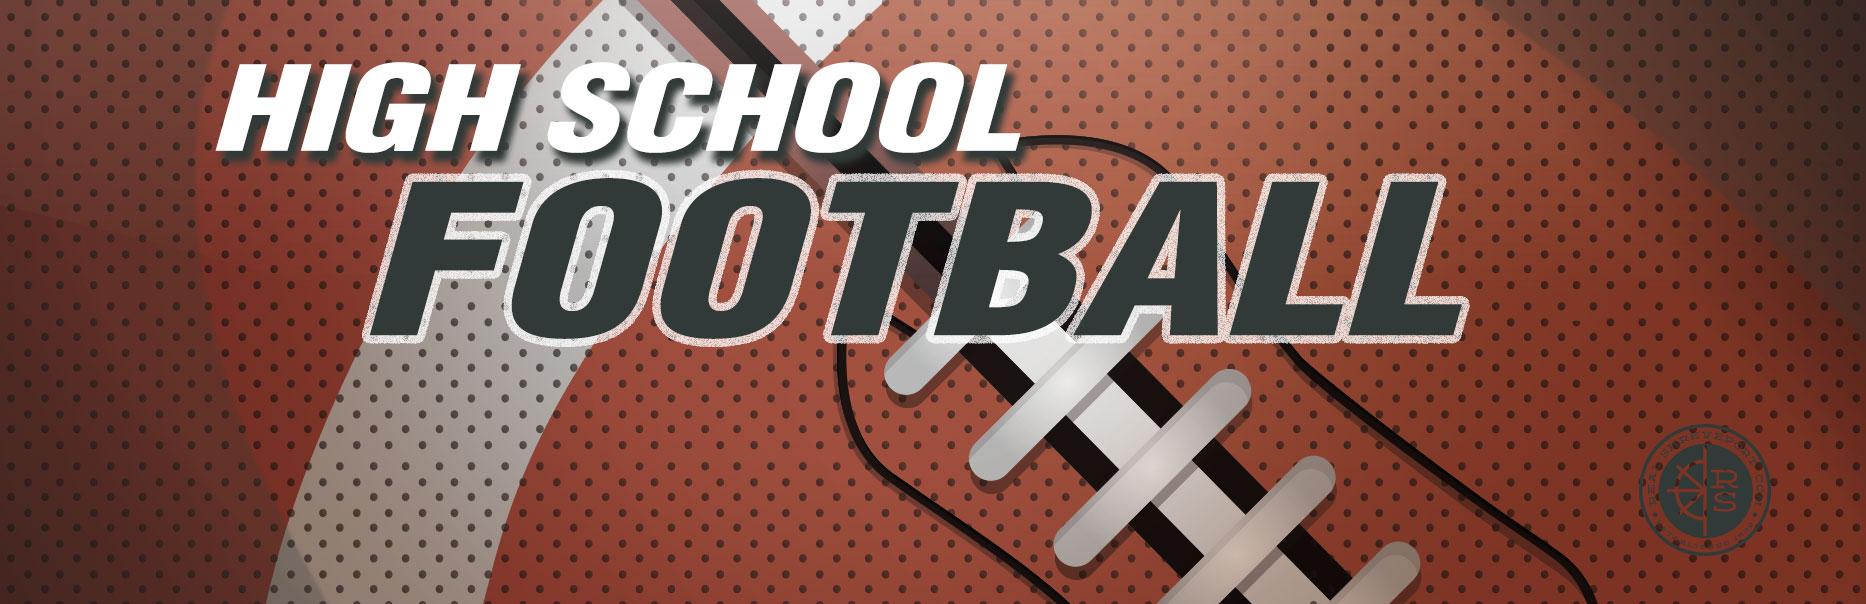 HS-Football-Header